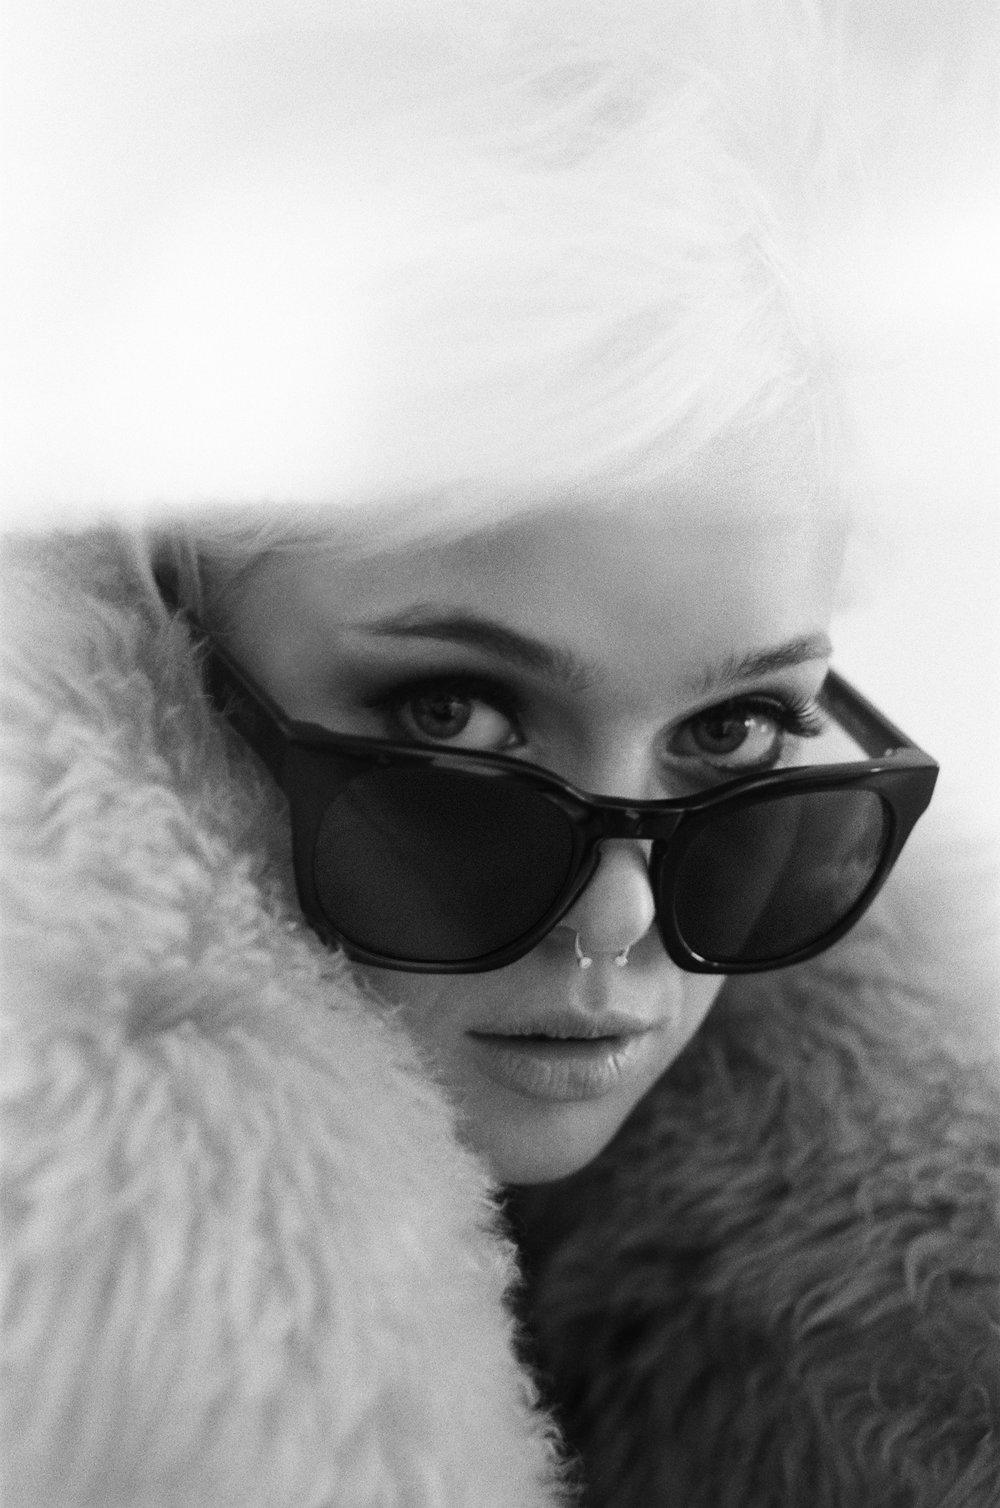 2017-filtrate-eyewear-portrait-acetate-bowery-000094030005.jpg